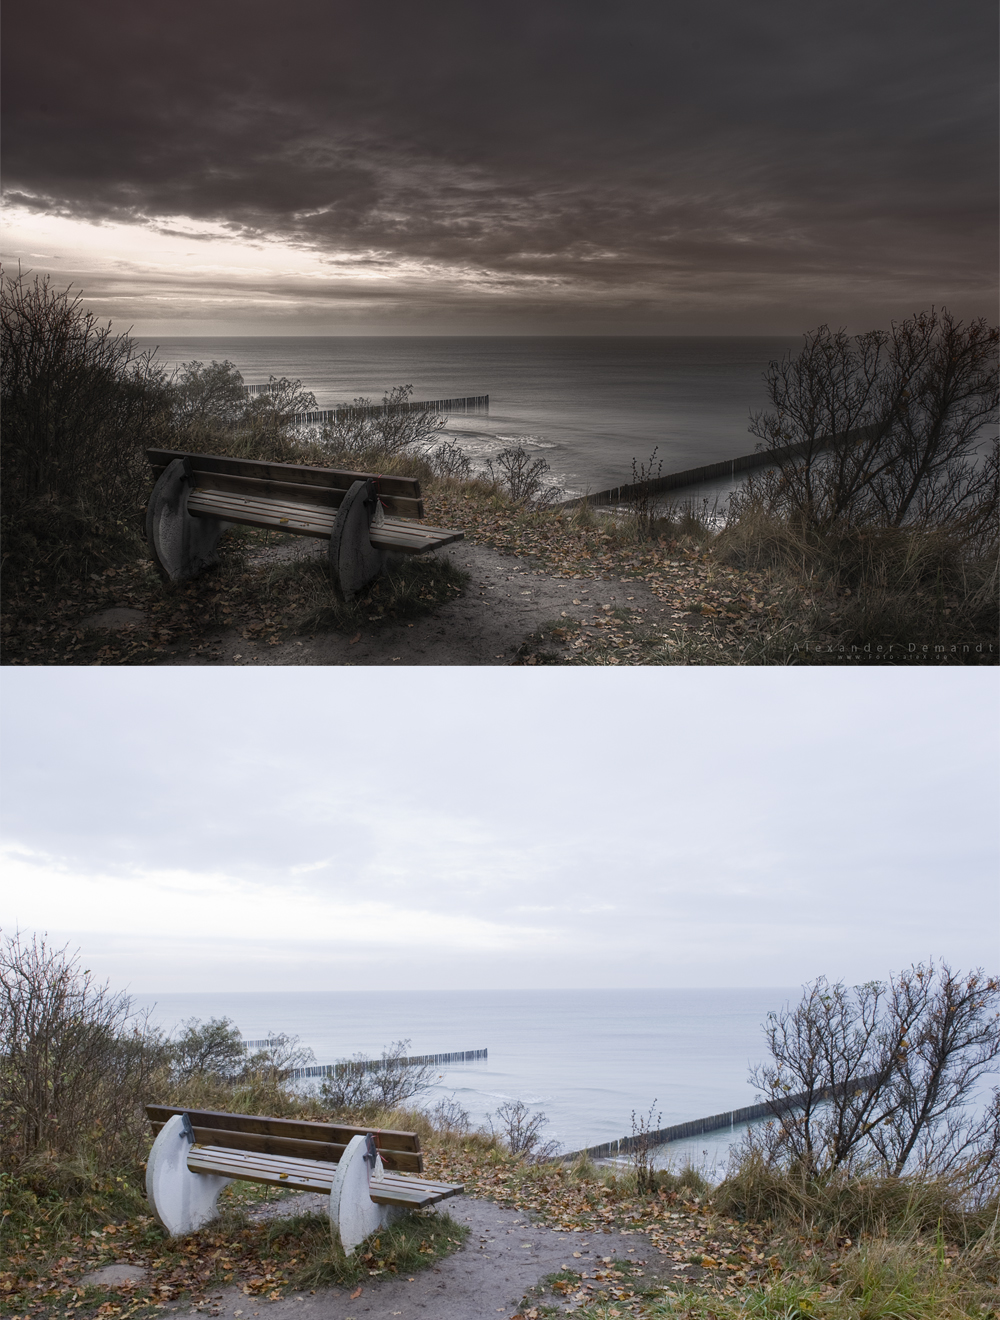 Landschaftsfotograf - Bildbearbeitung - Vergleich